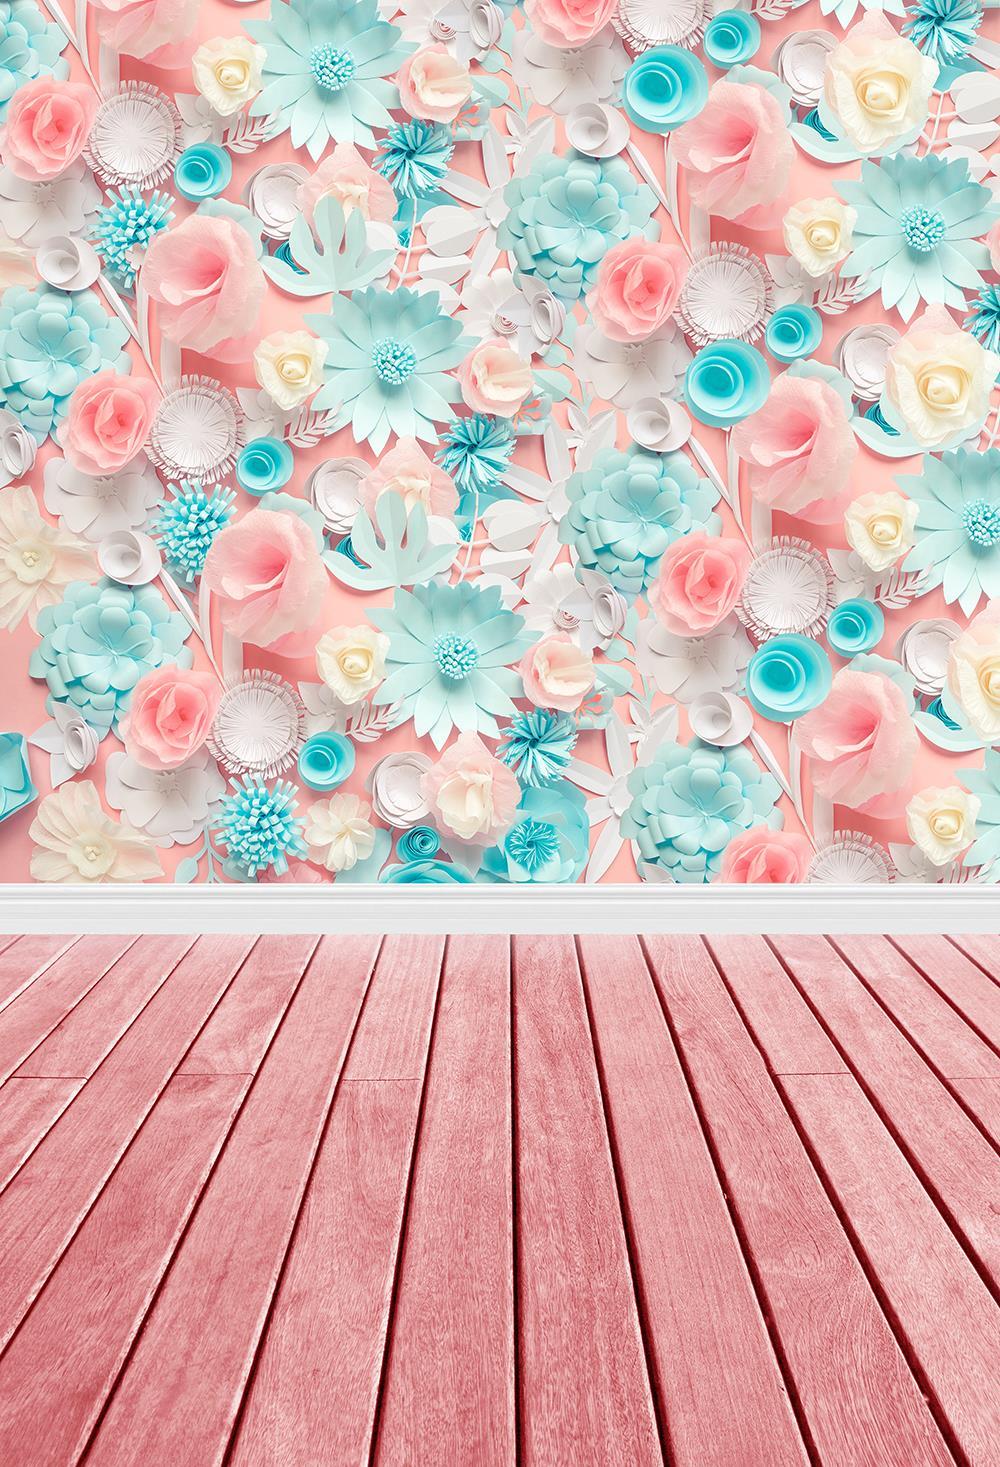 Telón de fondo de fotografía Floral para cumpleaños, foto de flores, Fondo de fotografía, ideal como cabina de fotos, W-1764 de vinilo sin brillo HUAYI